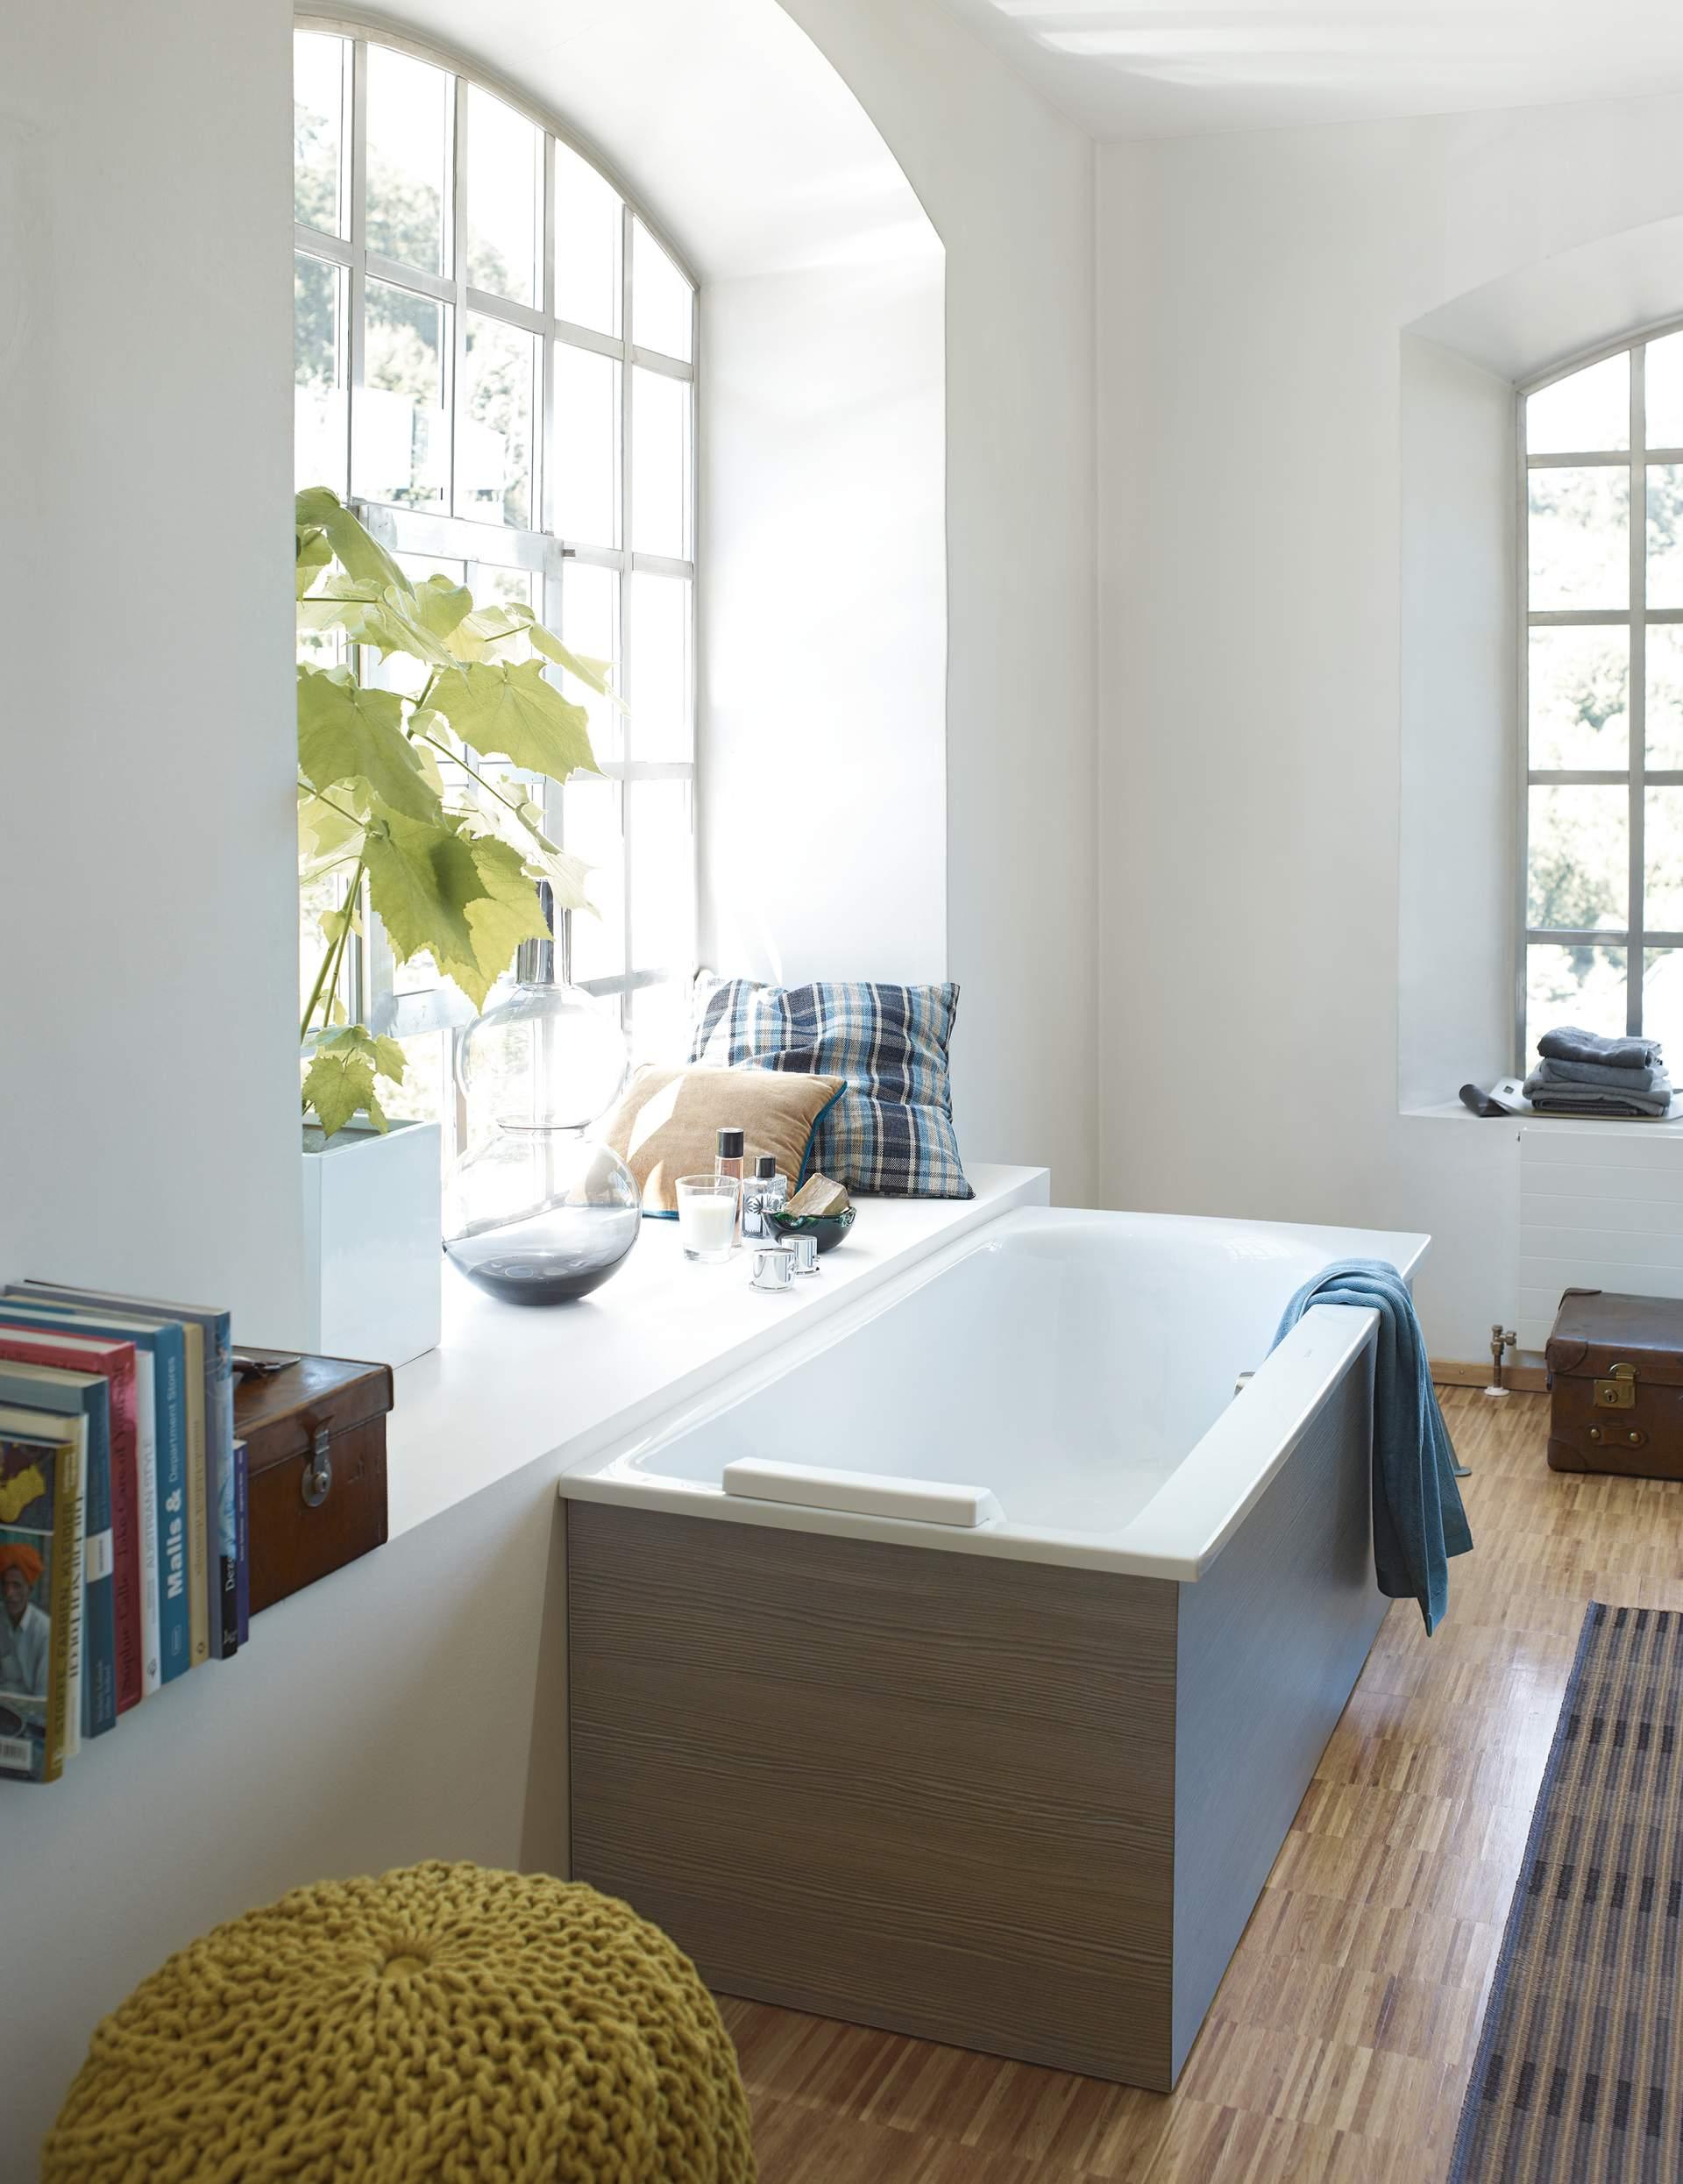 darling new whirlwanne 760240 duravit. Black Bedroom Furniture Sets. Home Design Ideas